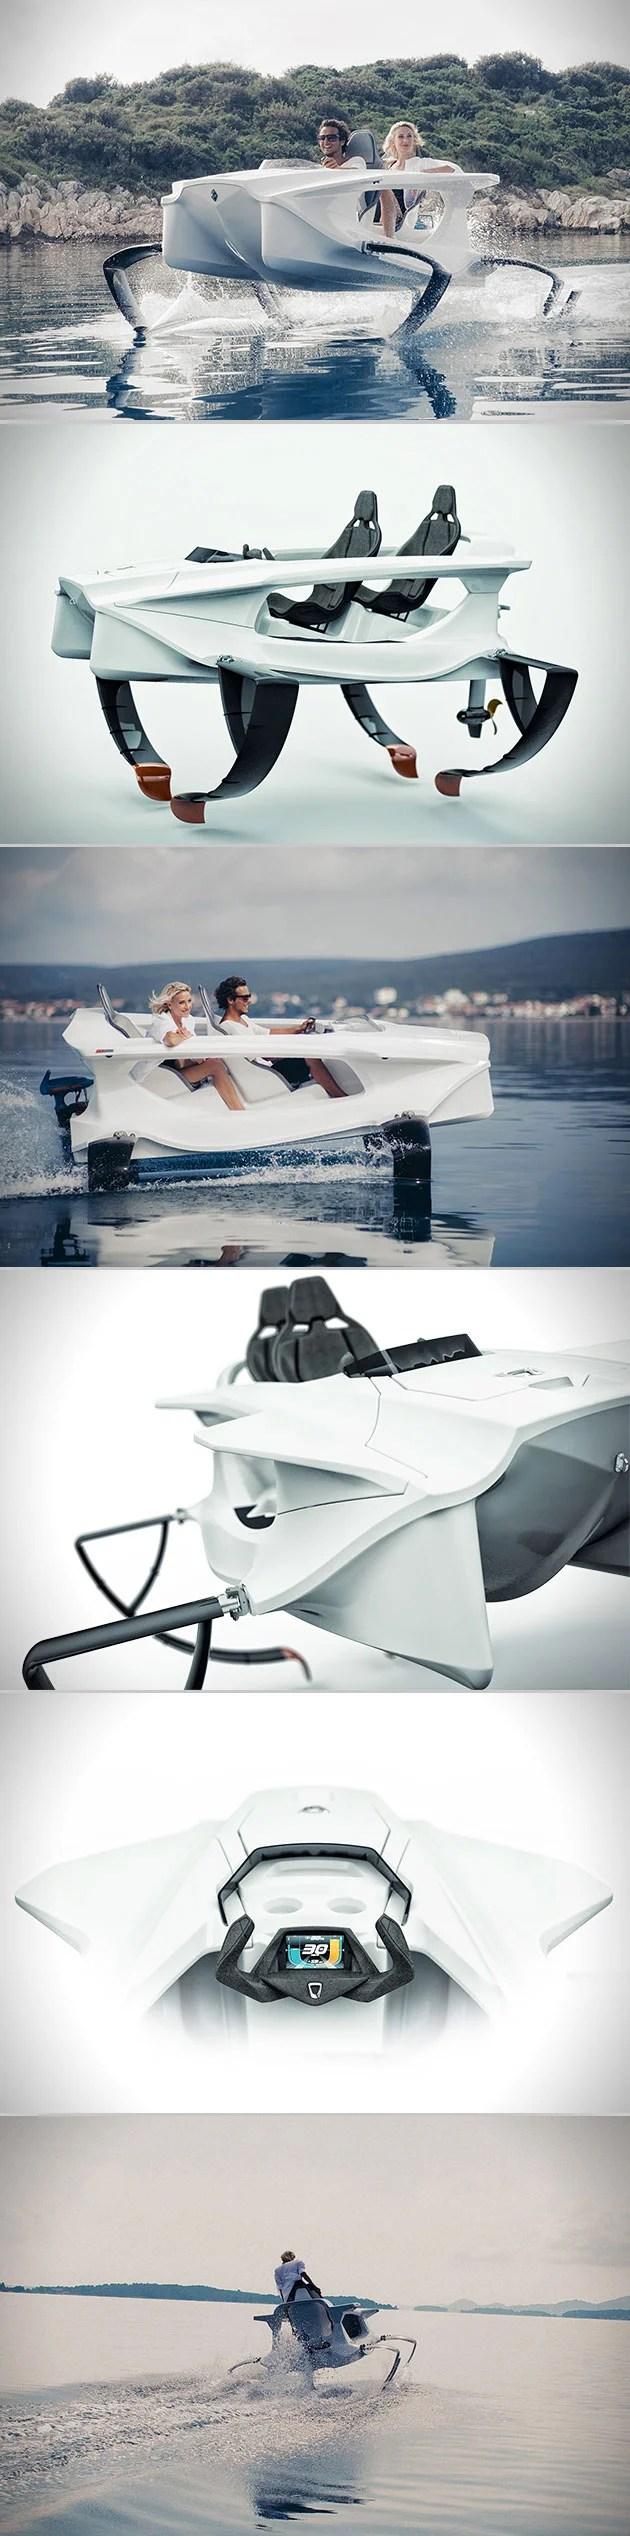 quadrofoil-personal-watercraft